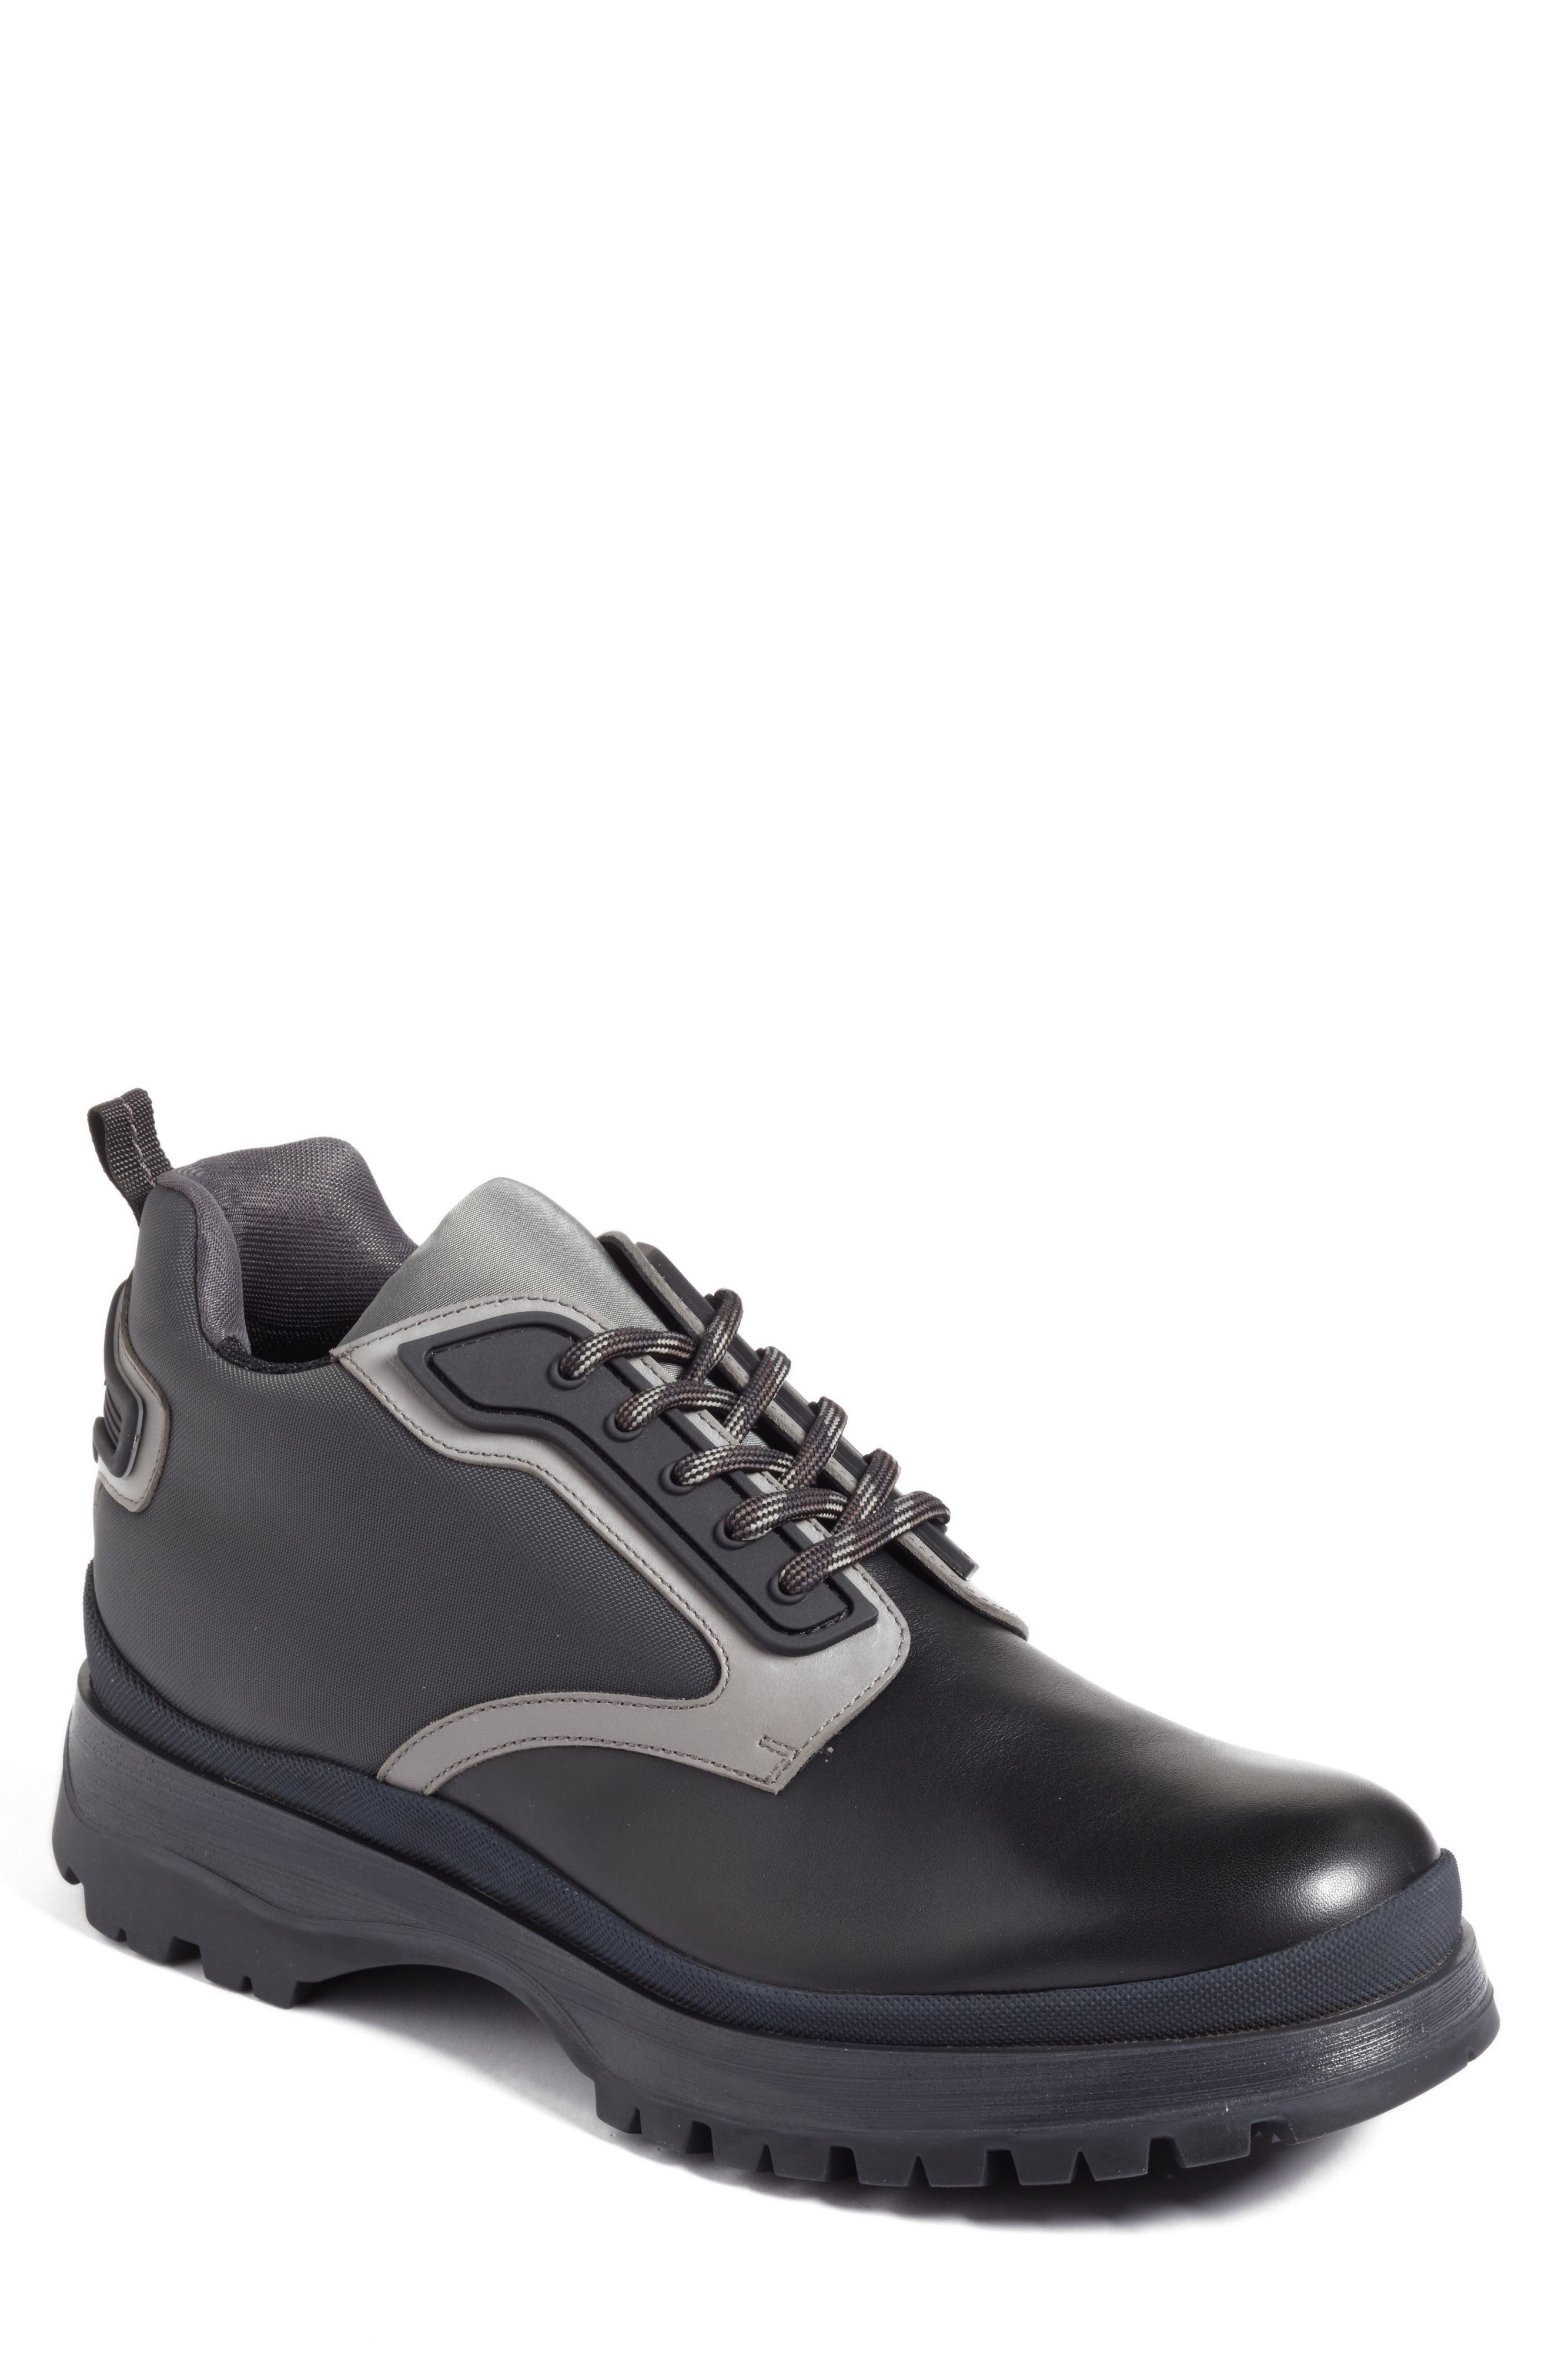 Main Image - Prada Linea Rossa Tech Sneaker Boot (Men)